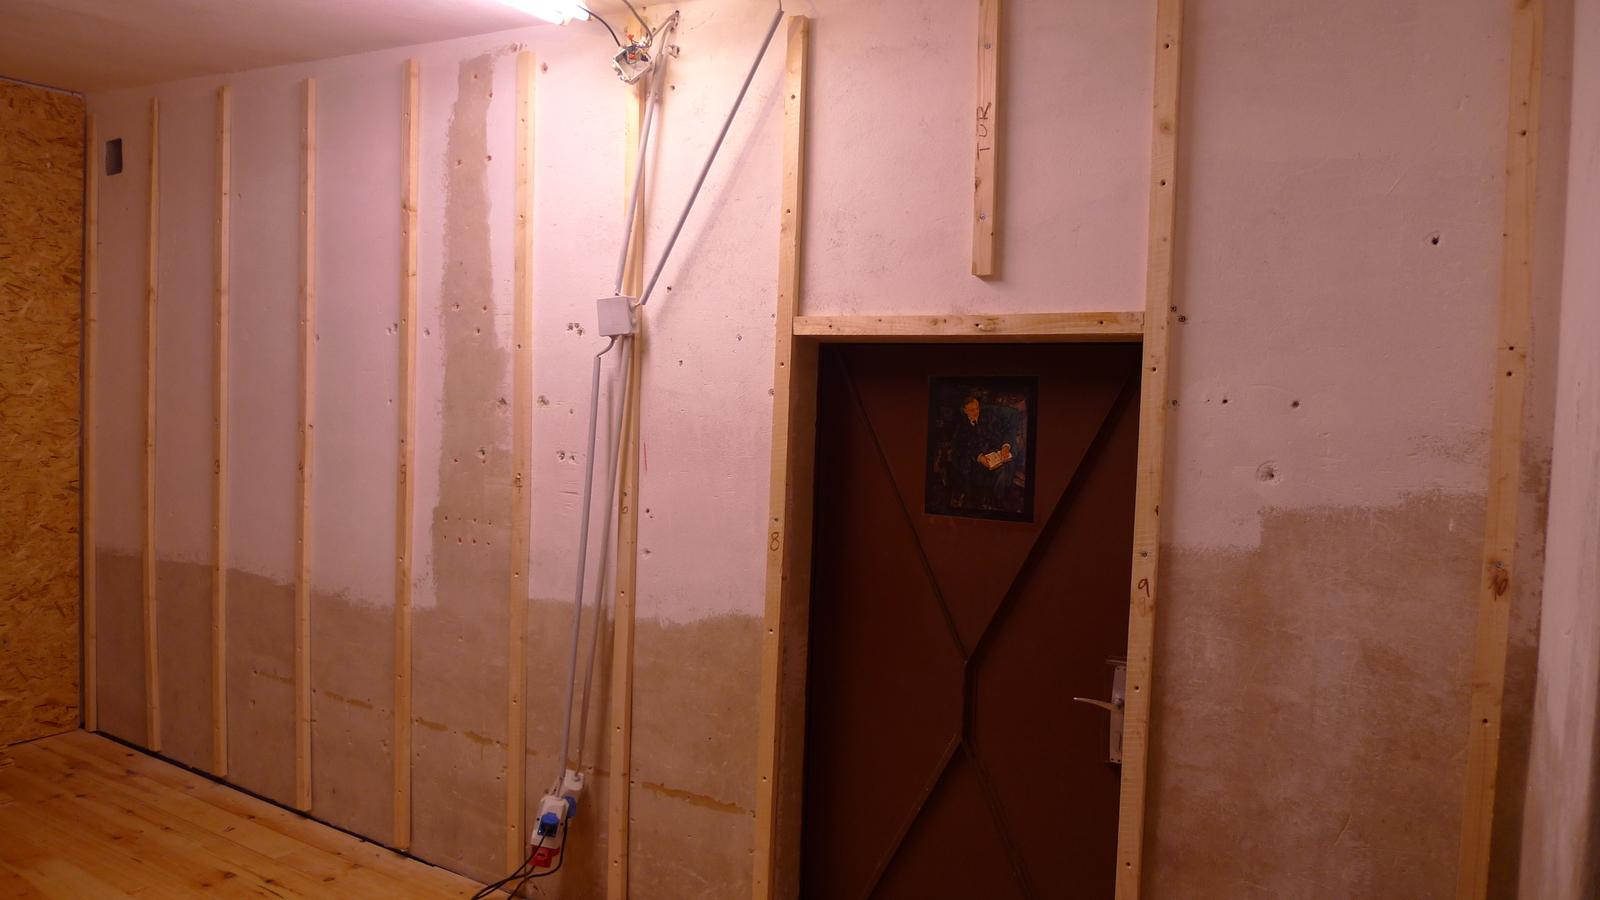 200 lattung. Black Bedroom Furniture Sets. Home Design Ideas